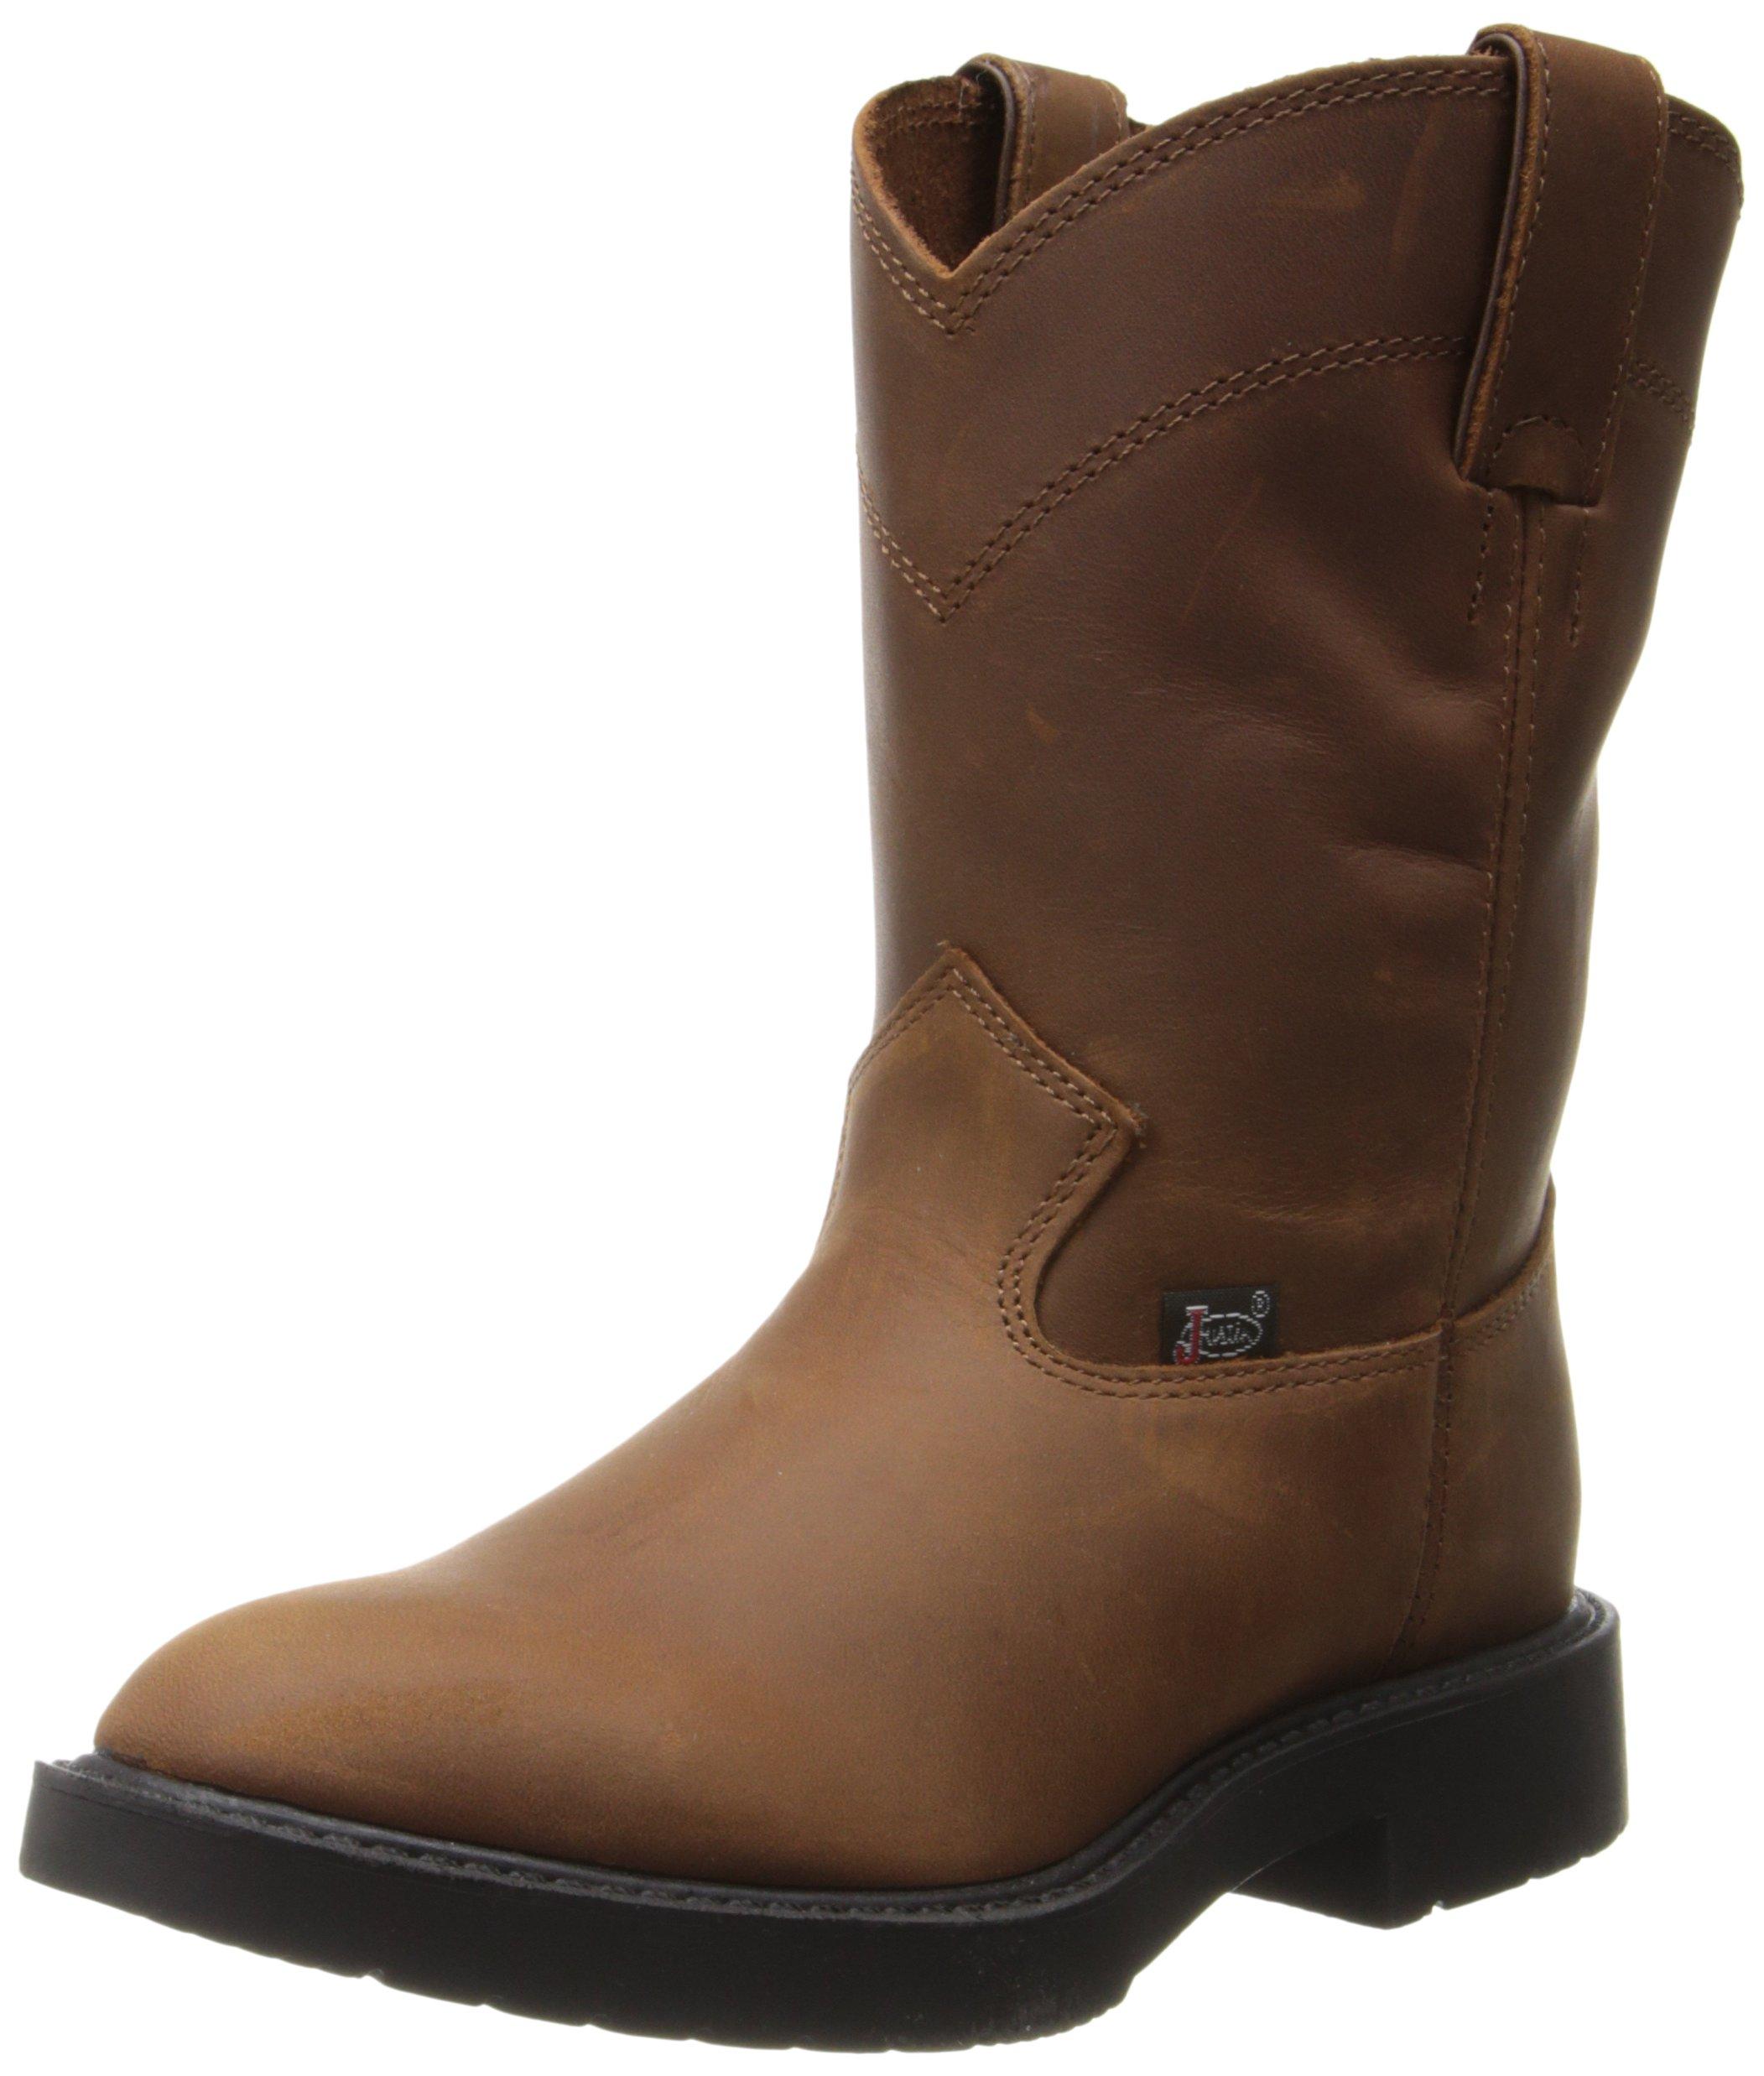 Justin Boots Work Boots (Toddler/Little Kid),Aged Bark,5.5 D US Little Kid